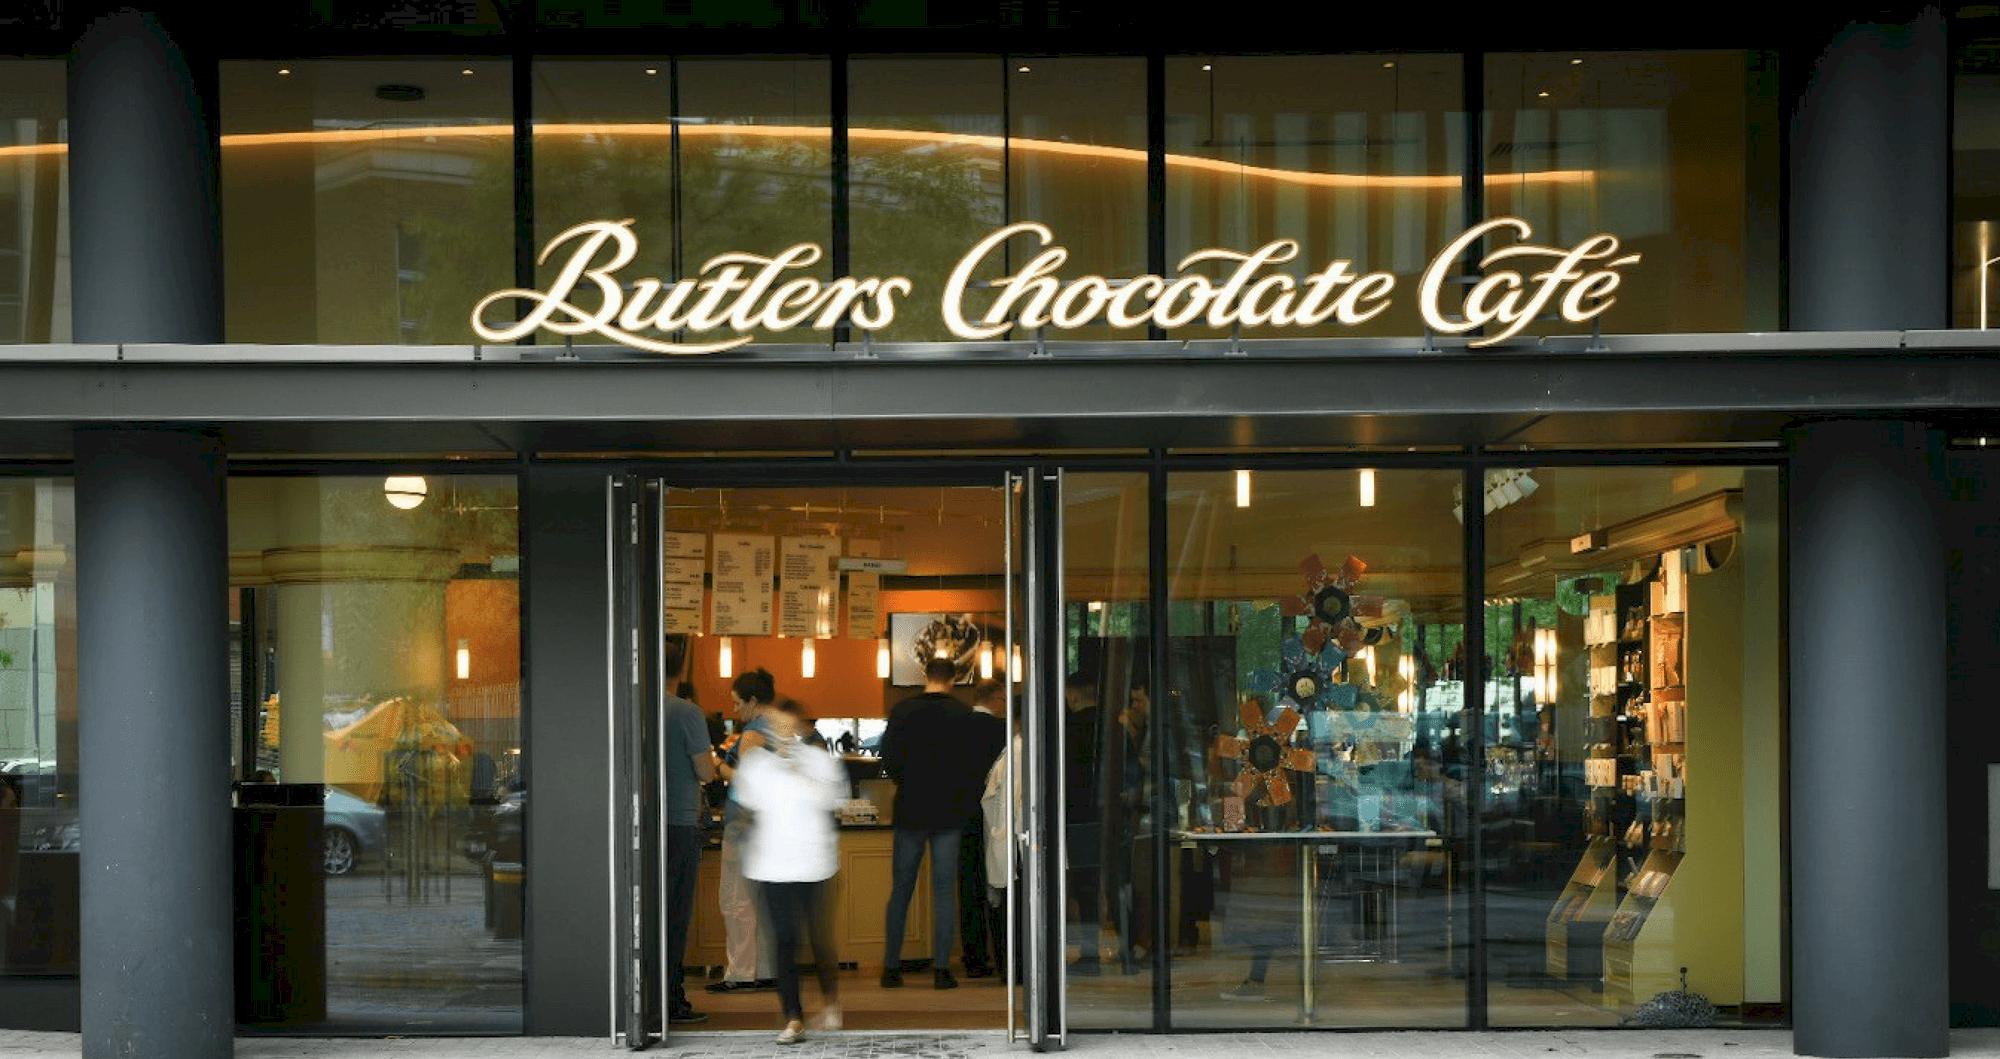 Butlers Chocolate Café, Ballsbridge